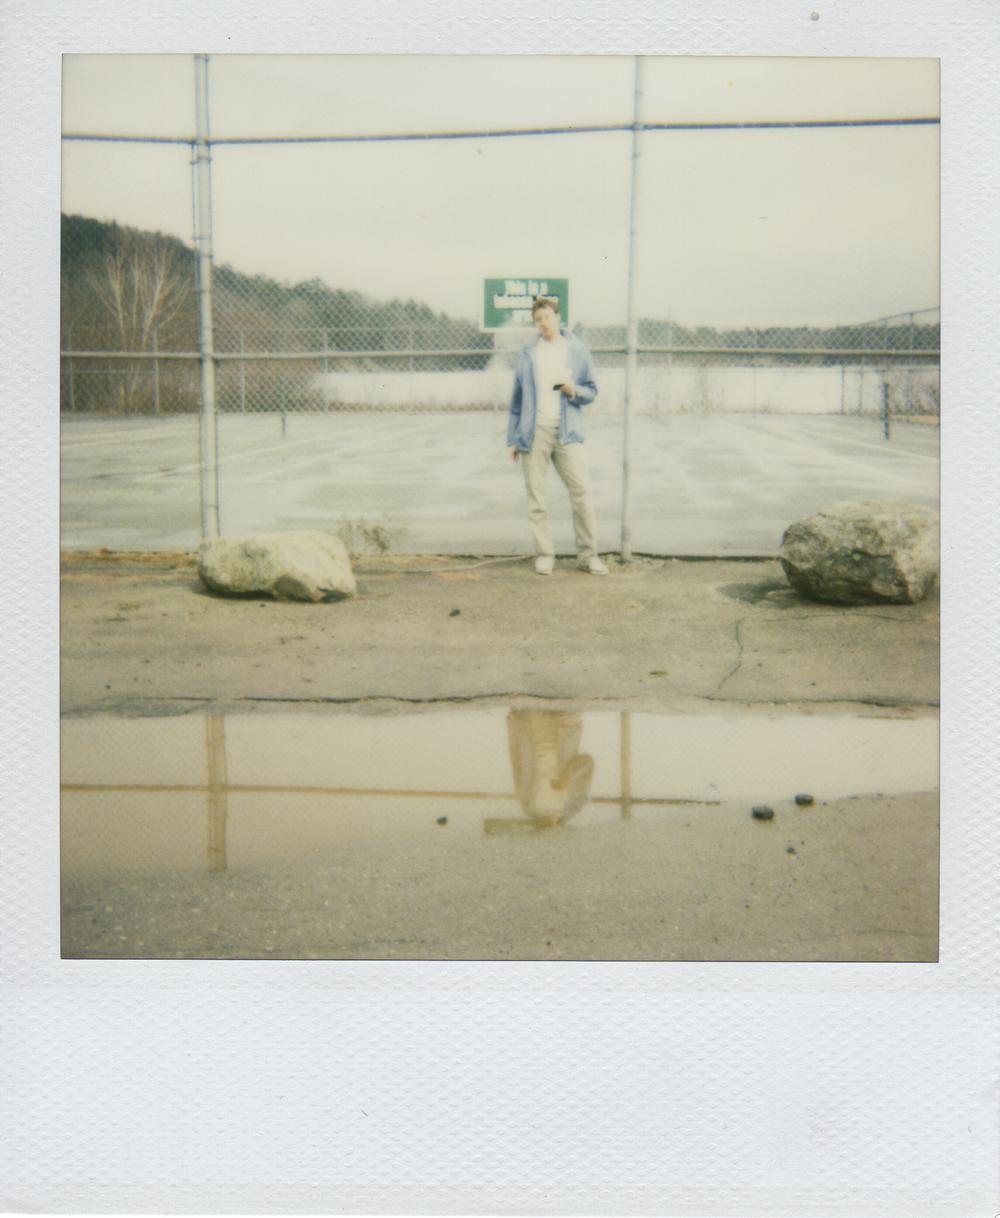 jlaurence-polaroid-155.jpg